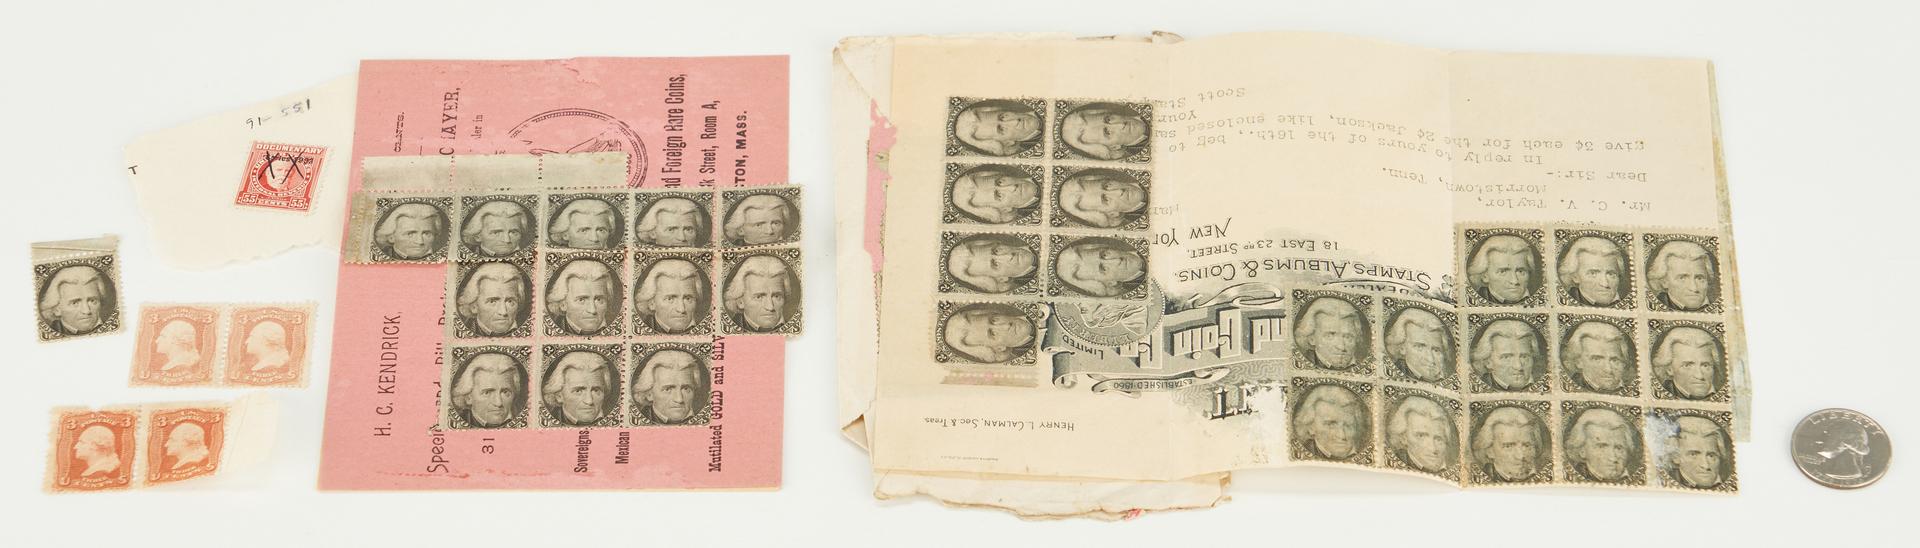 "Lot 724: 39 Andrew Jackson ""Black Jack"" Stamps, 47 items"